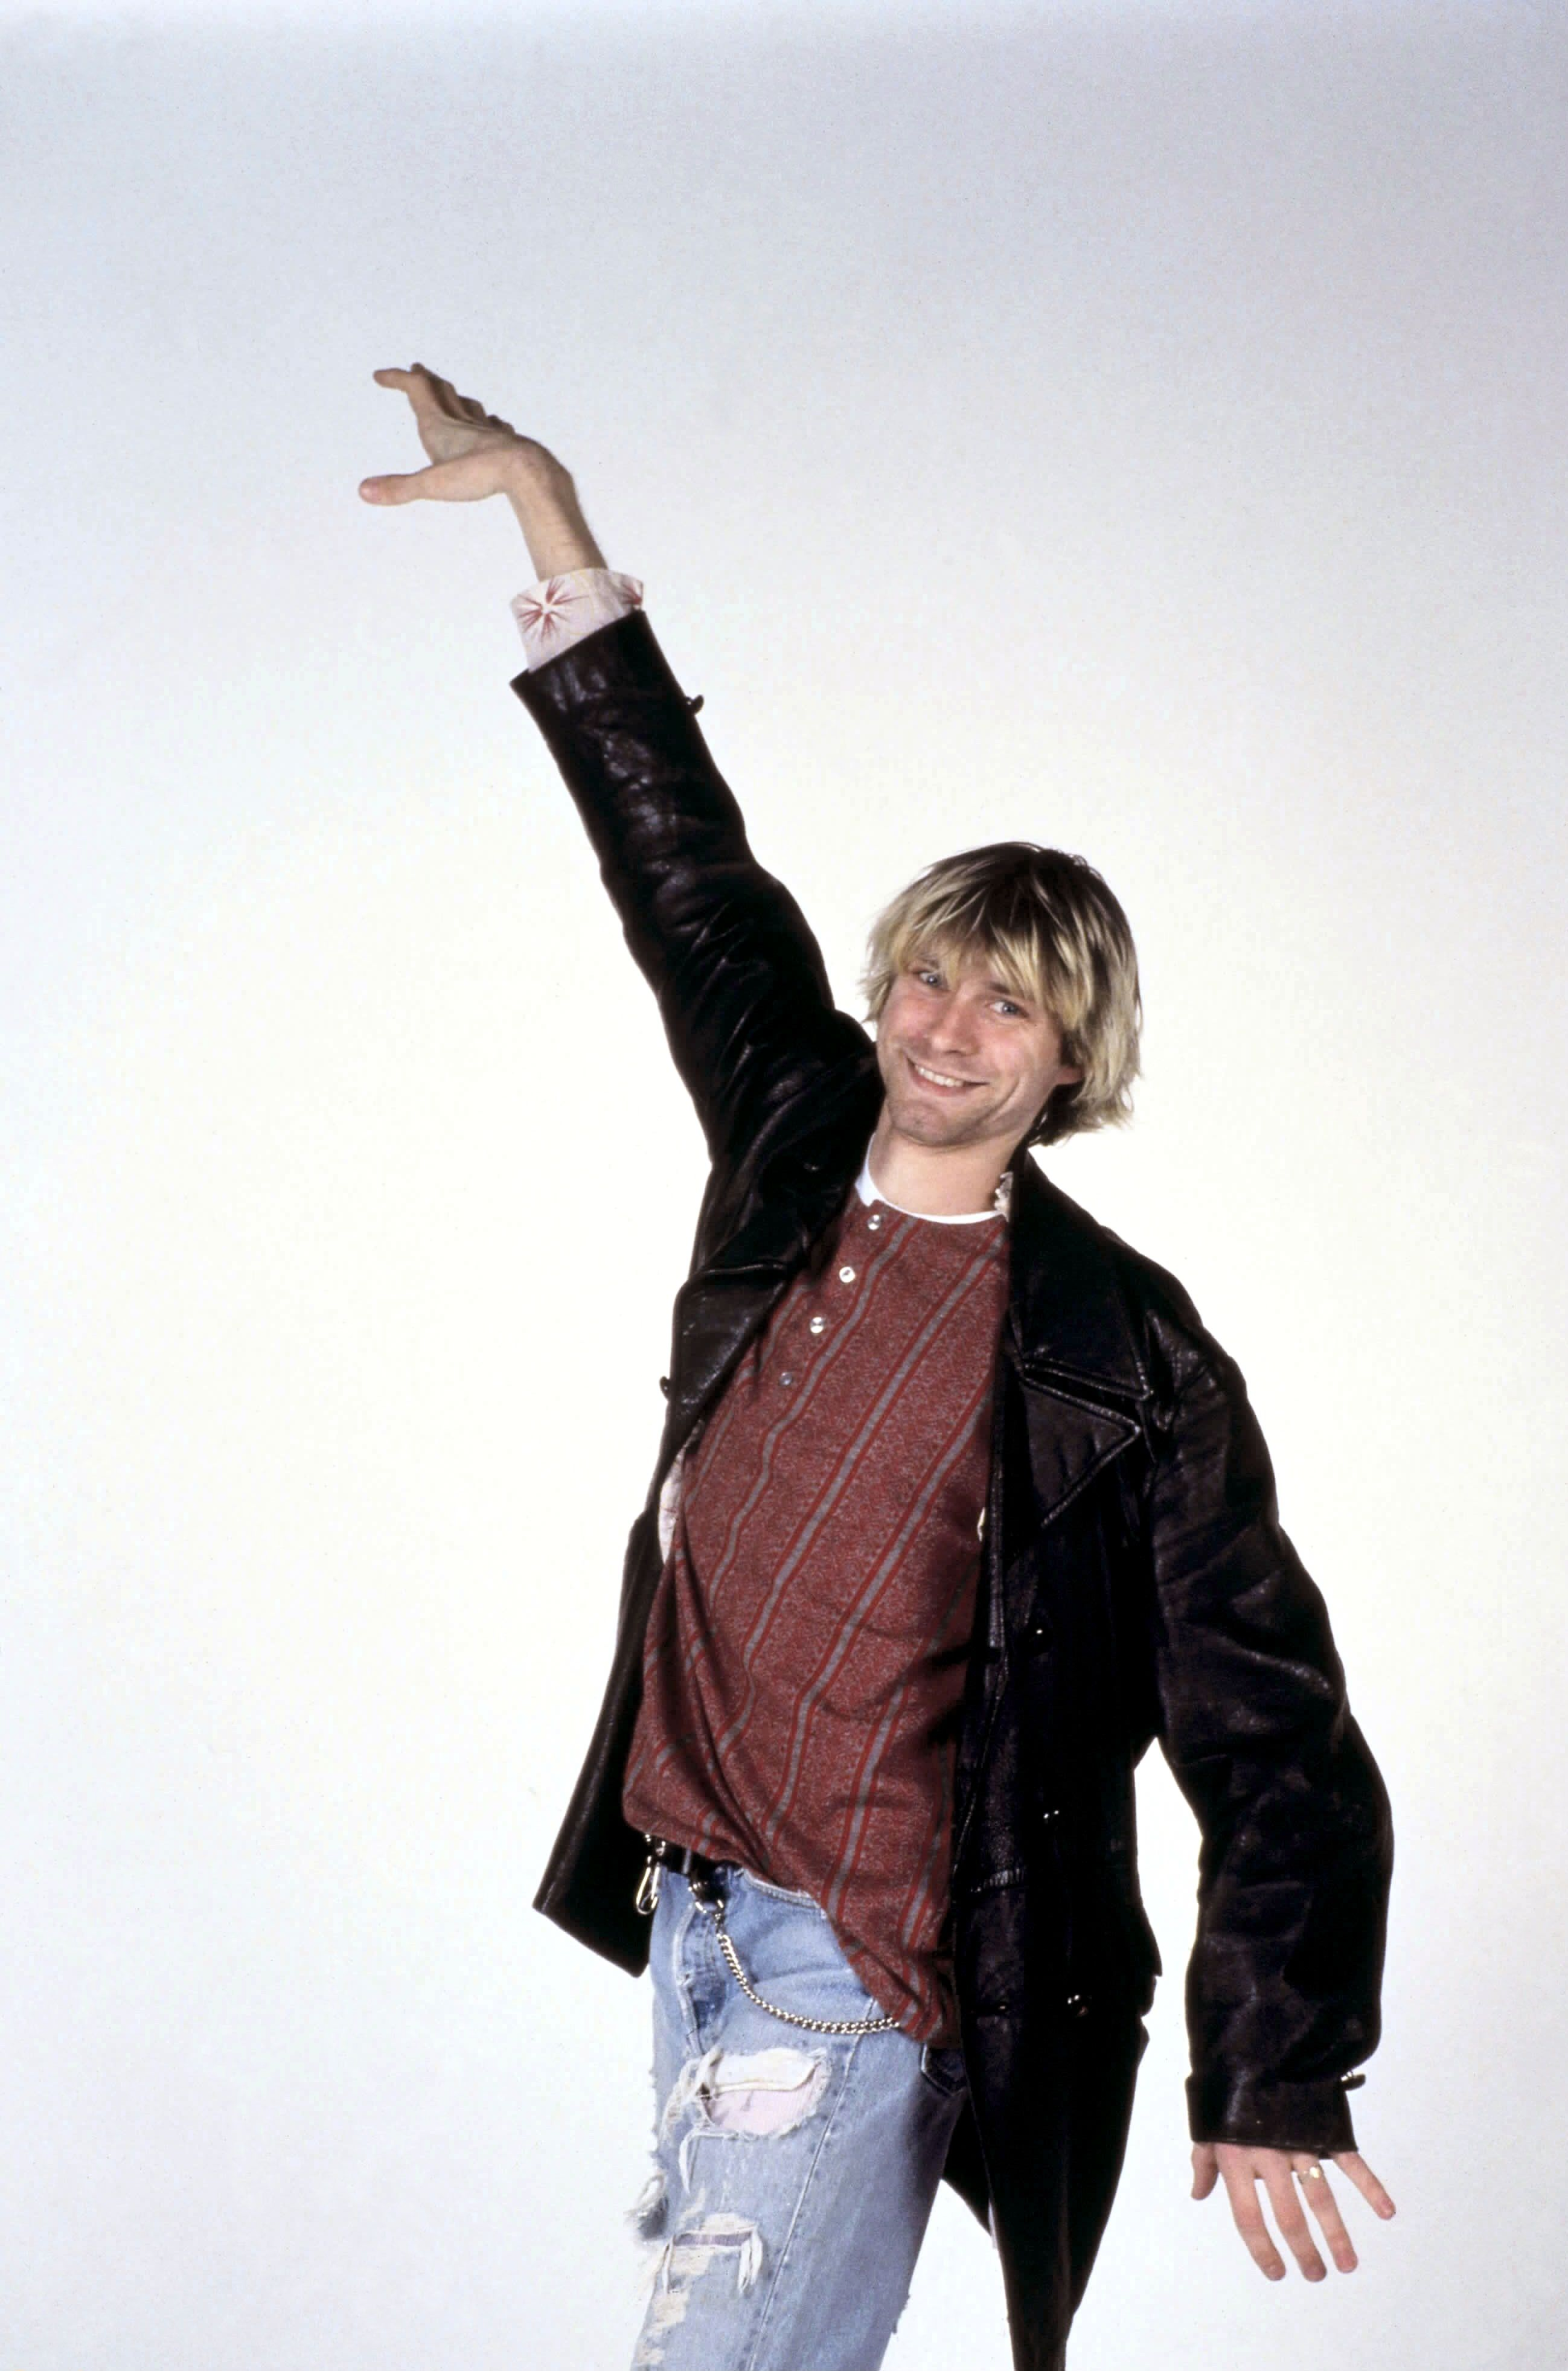 Kurt Cobain November 1992 Seattle Wa Nirvana Kurt Cobain Kurt Cobain Donald Cobain [ 3927 x 2597 Pixel ]